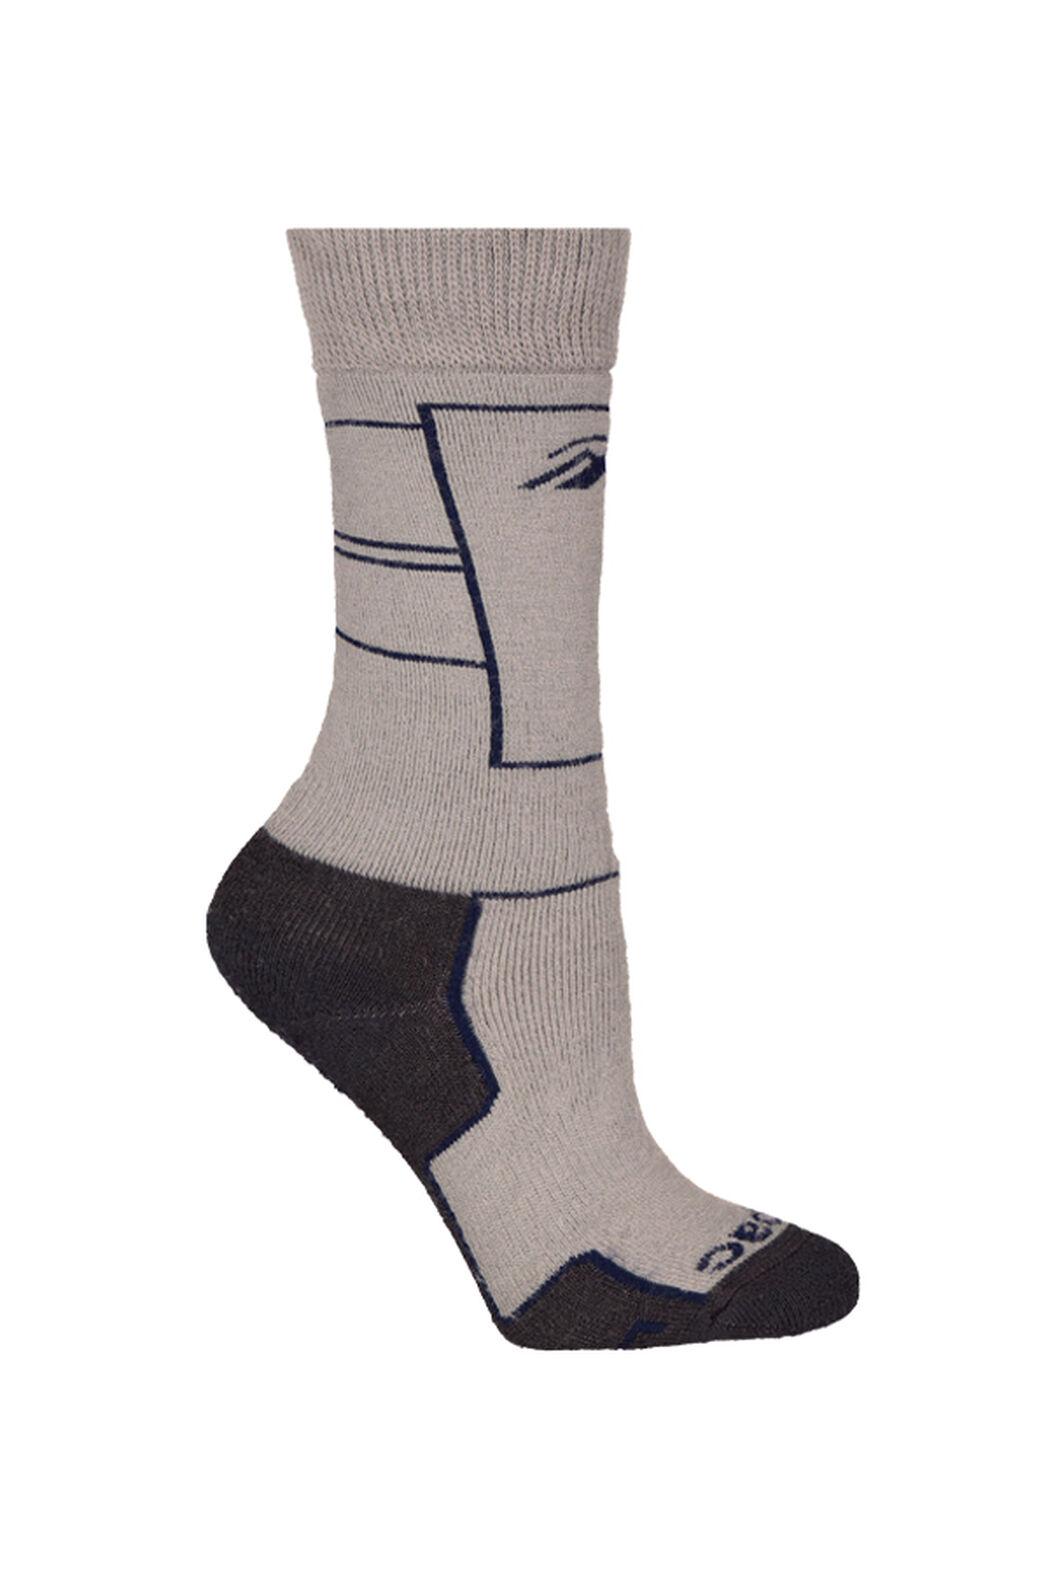 Macpac Ski Socks Kids', Black Iris/Alloy, hi-res